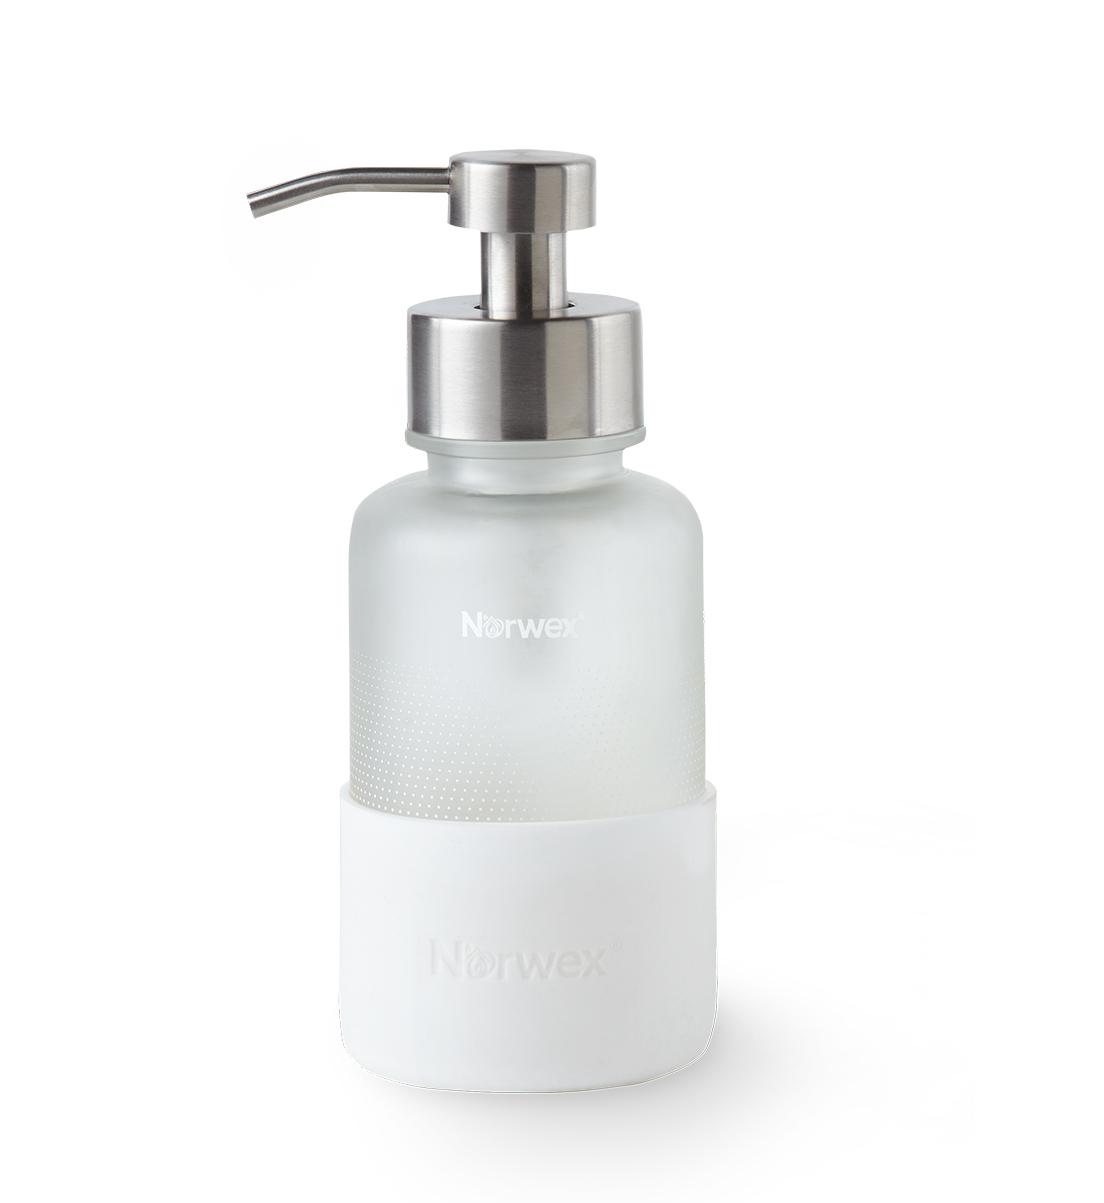 Forever Bottle with Foaming Hand Wash Dispenser, white